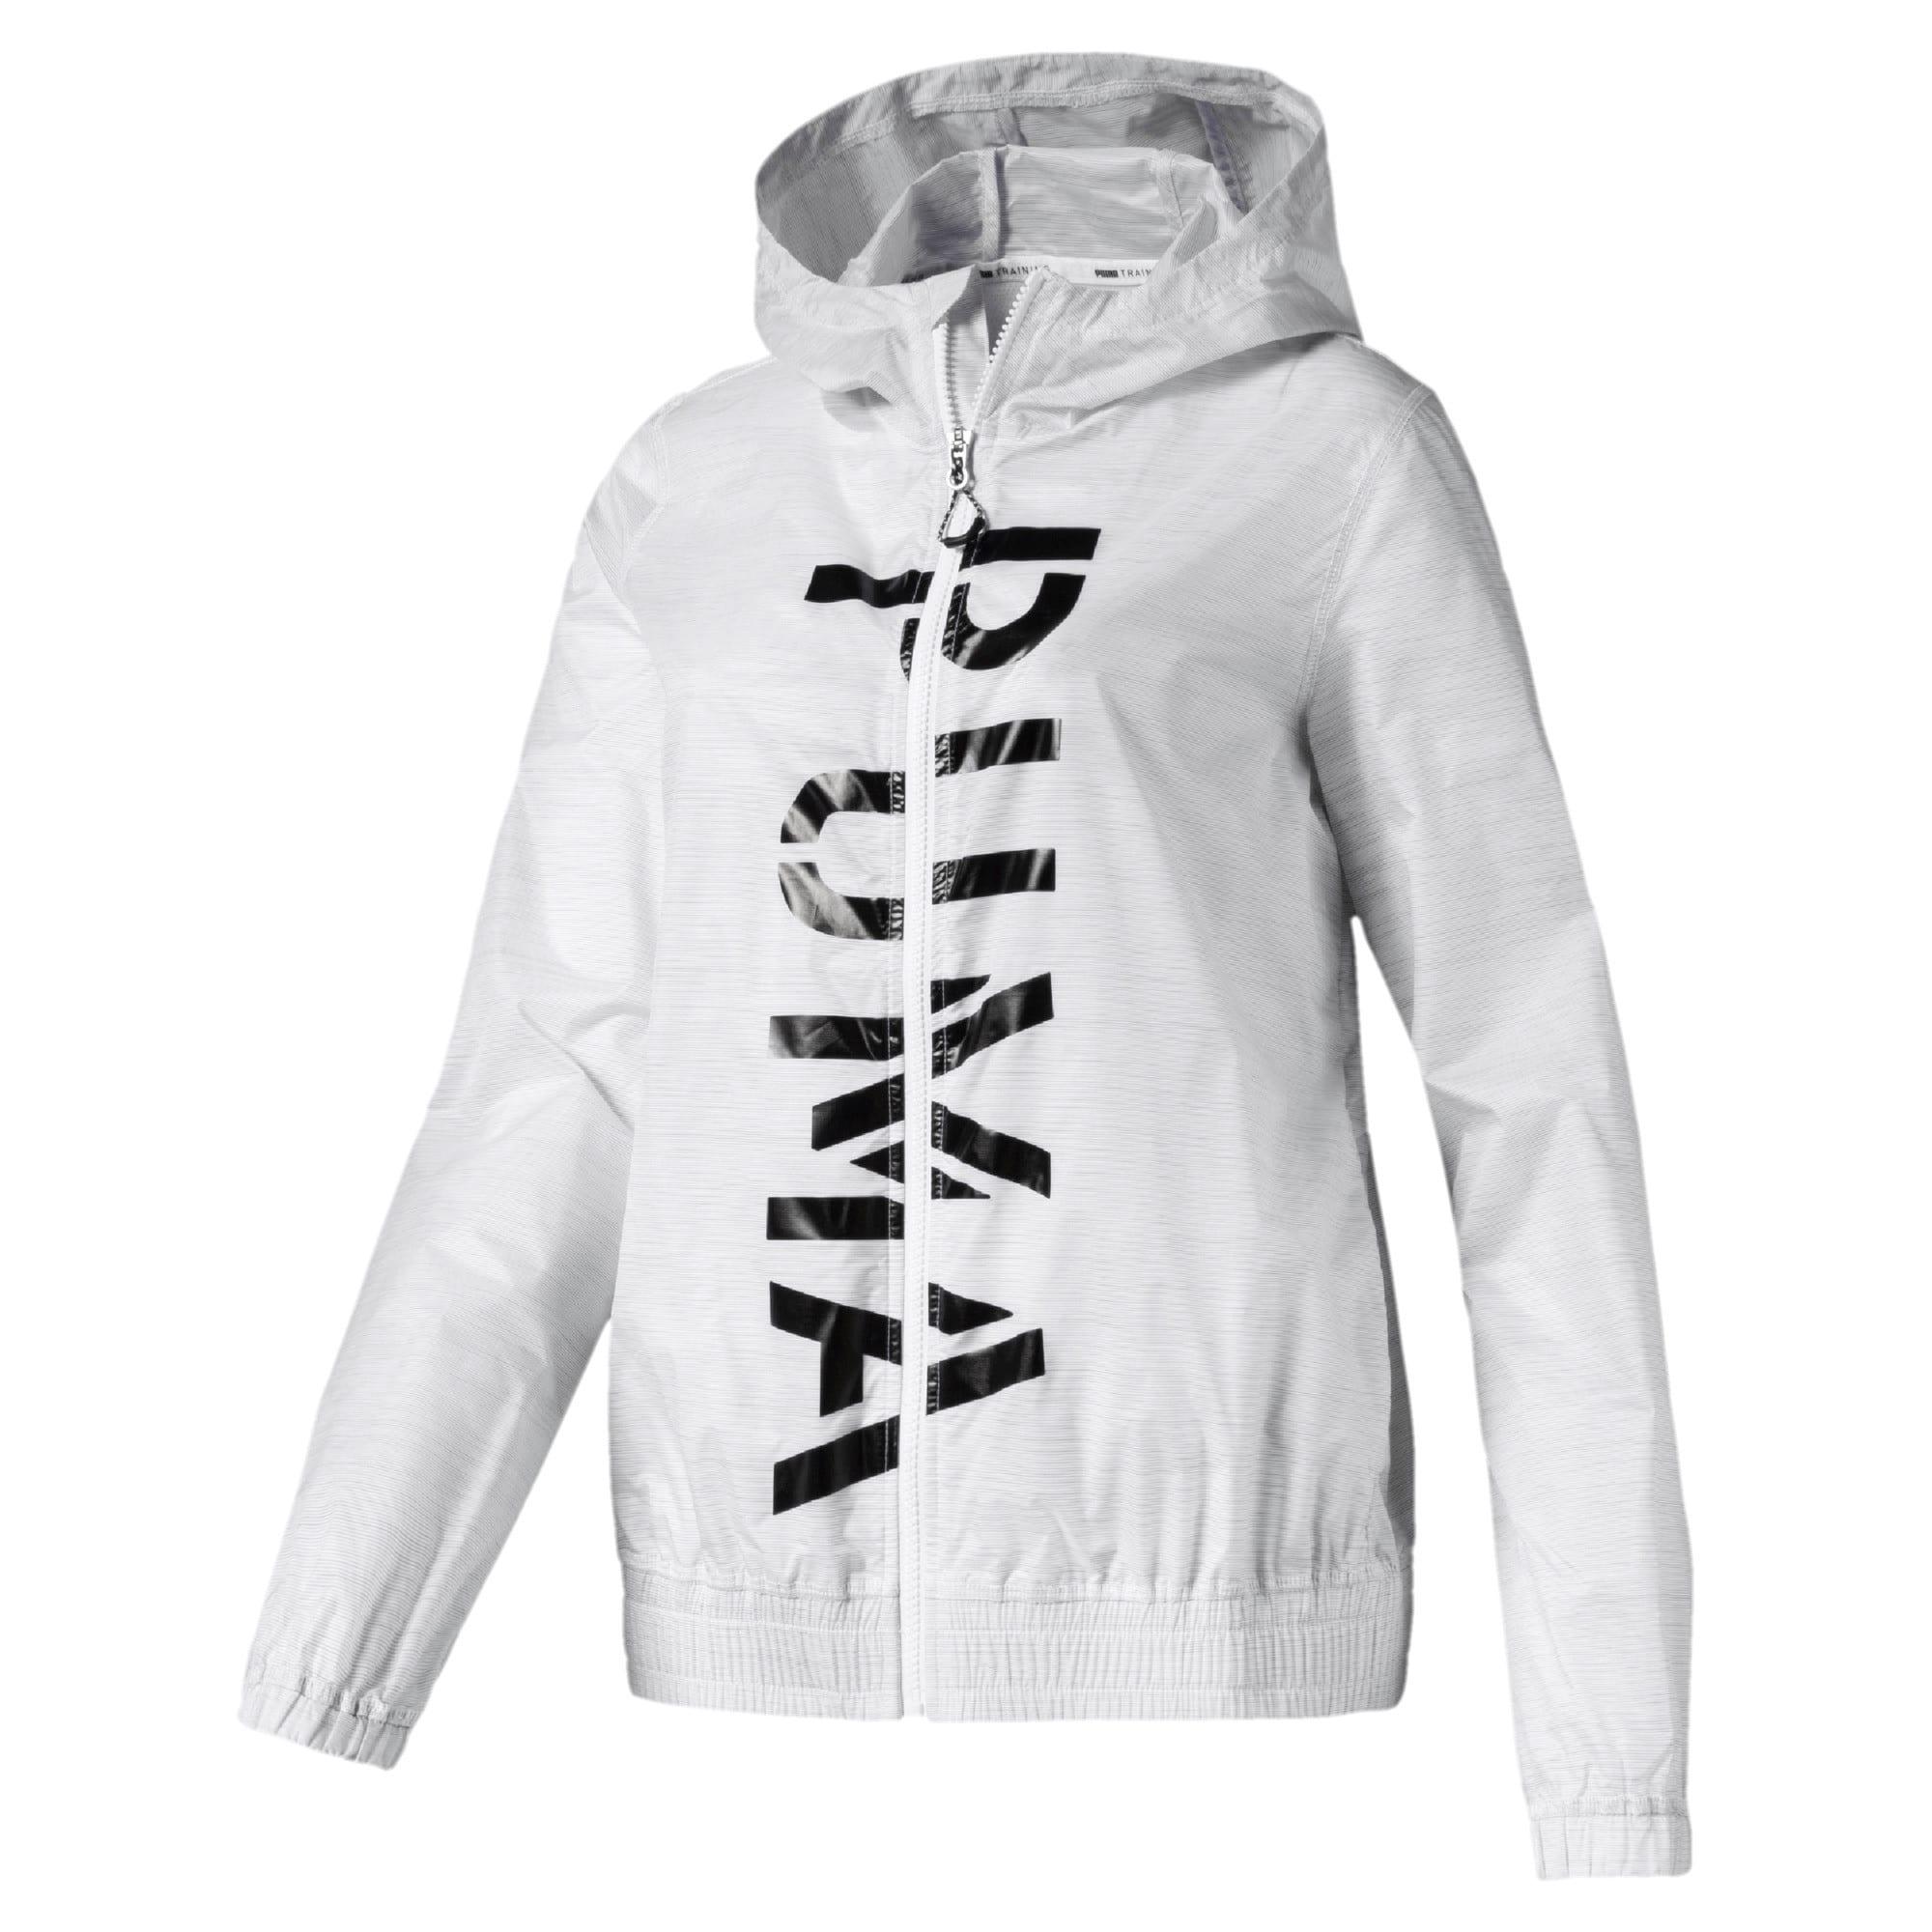 Miniatura 1 de Chaqueta tejida con estampa Be Bold para mujer, Puma White, mediano